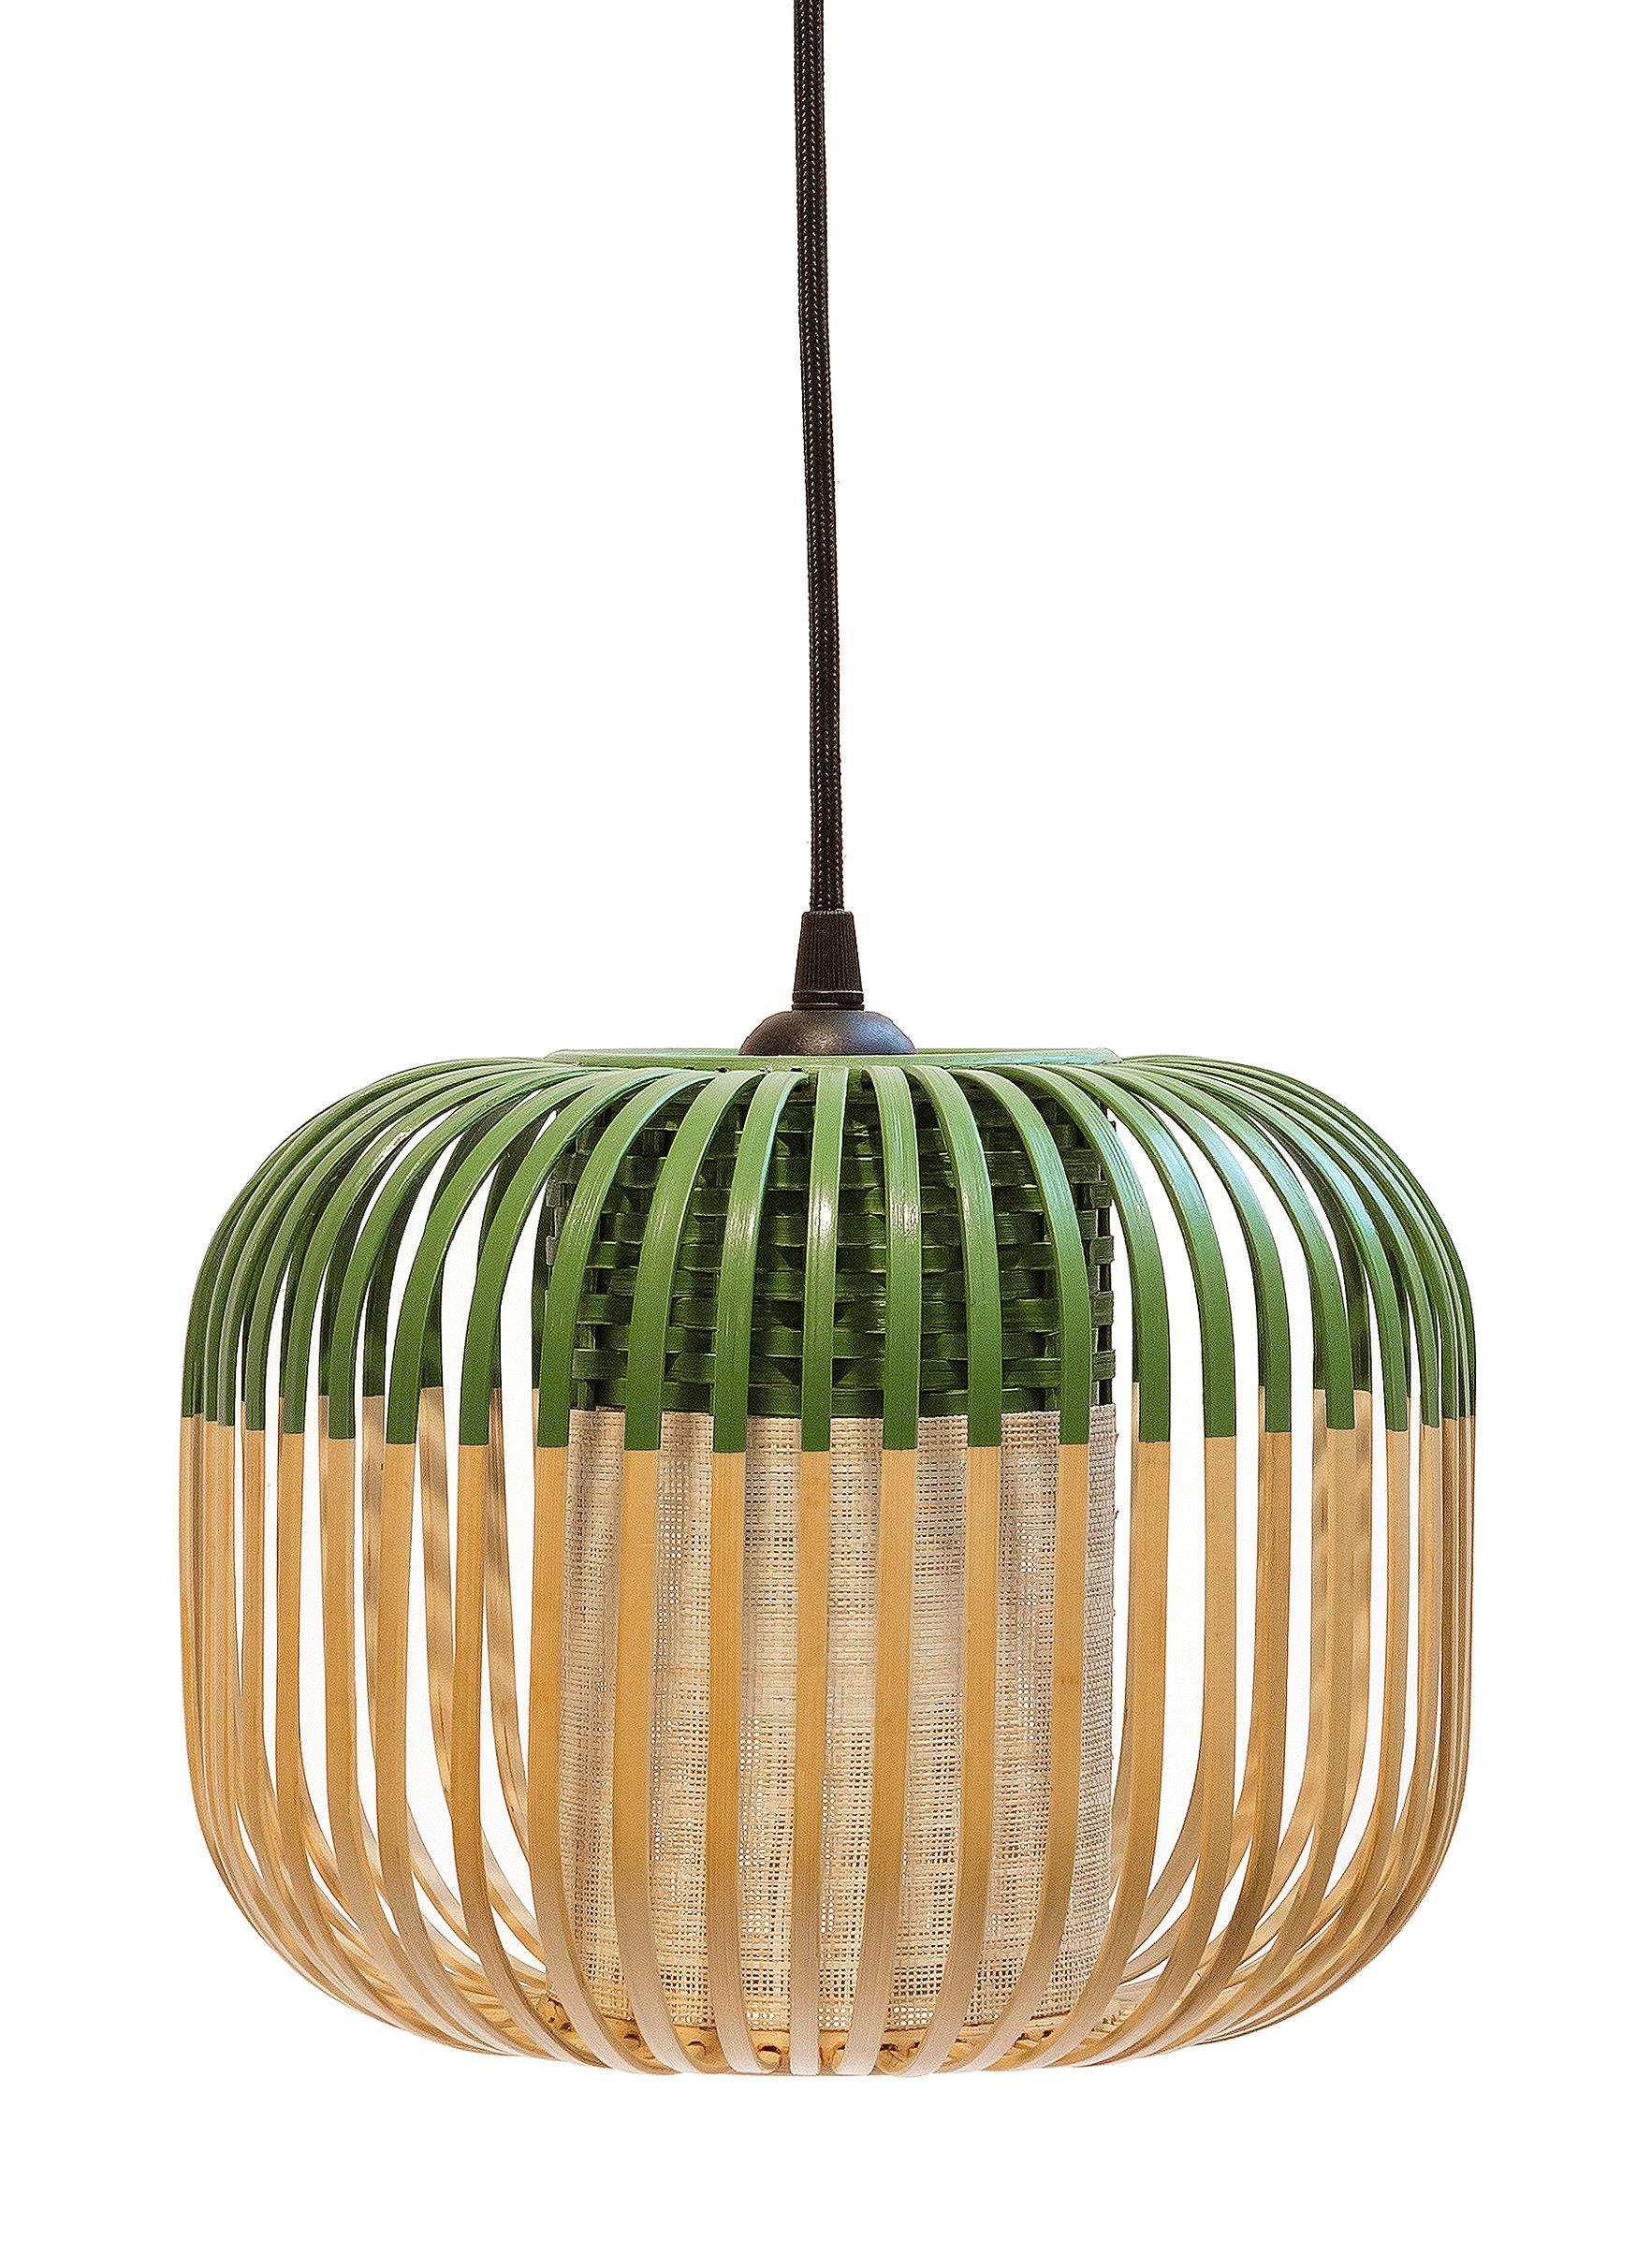 Lighting - Pendant Lighting - Bamboo Light XS Pendant - H 20 x Ø 27 cm by Forestier - Green / Natural - Fabric, Metal, Natural bamboo